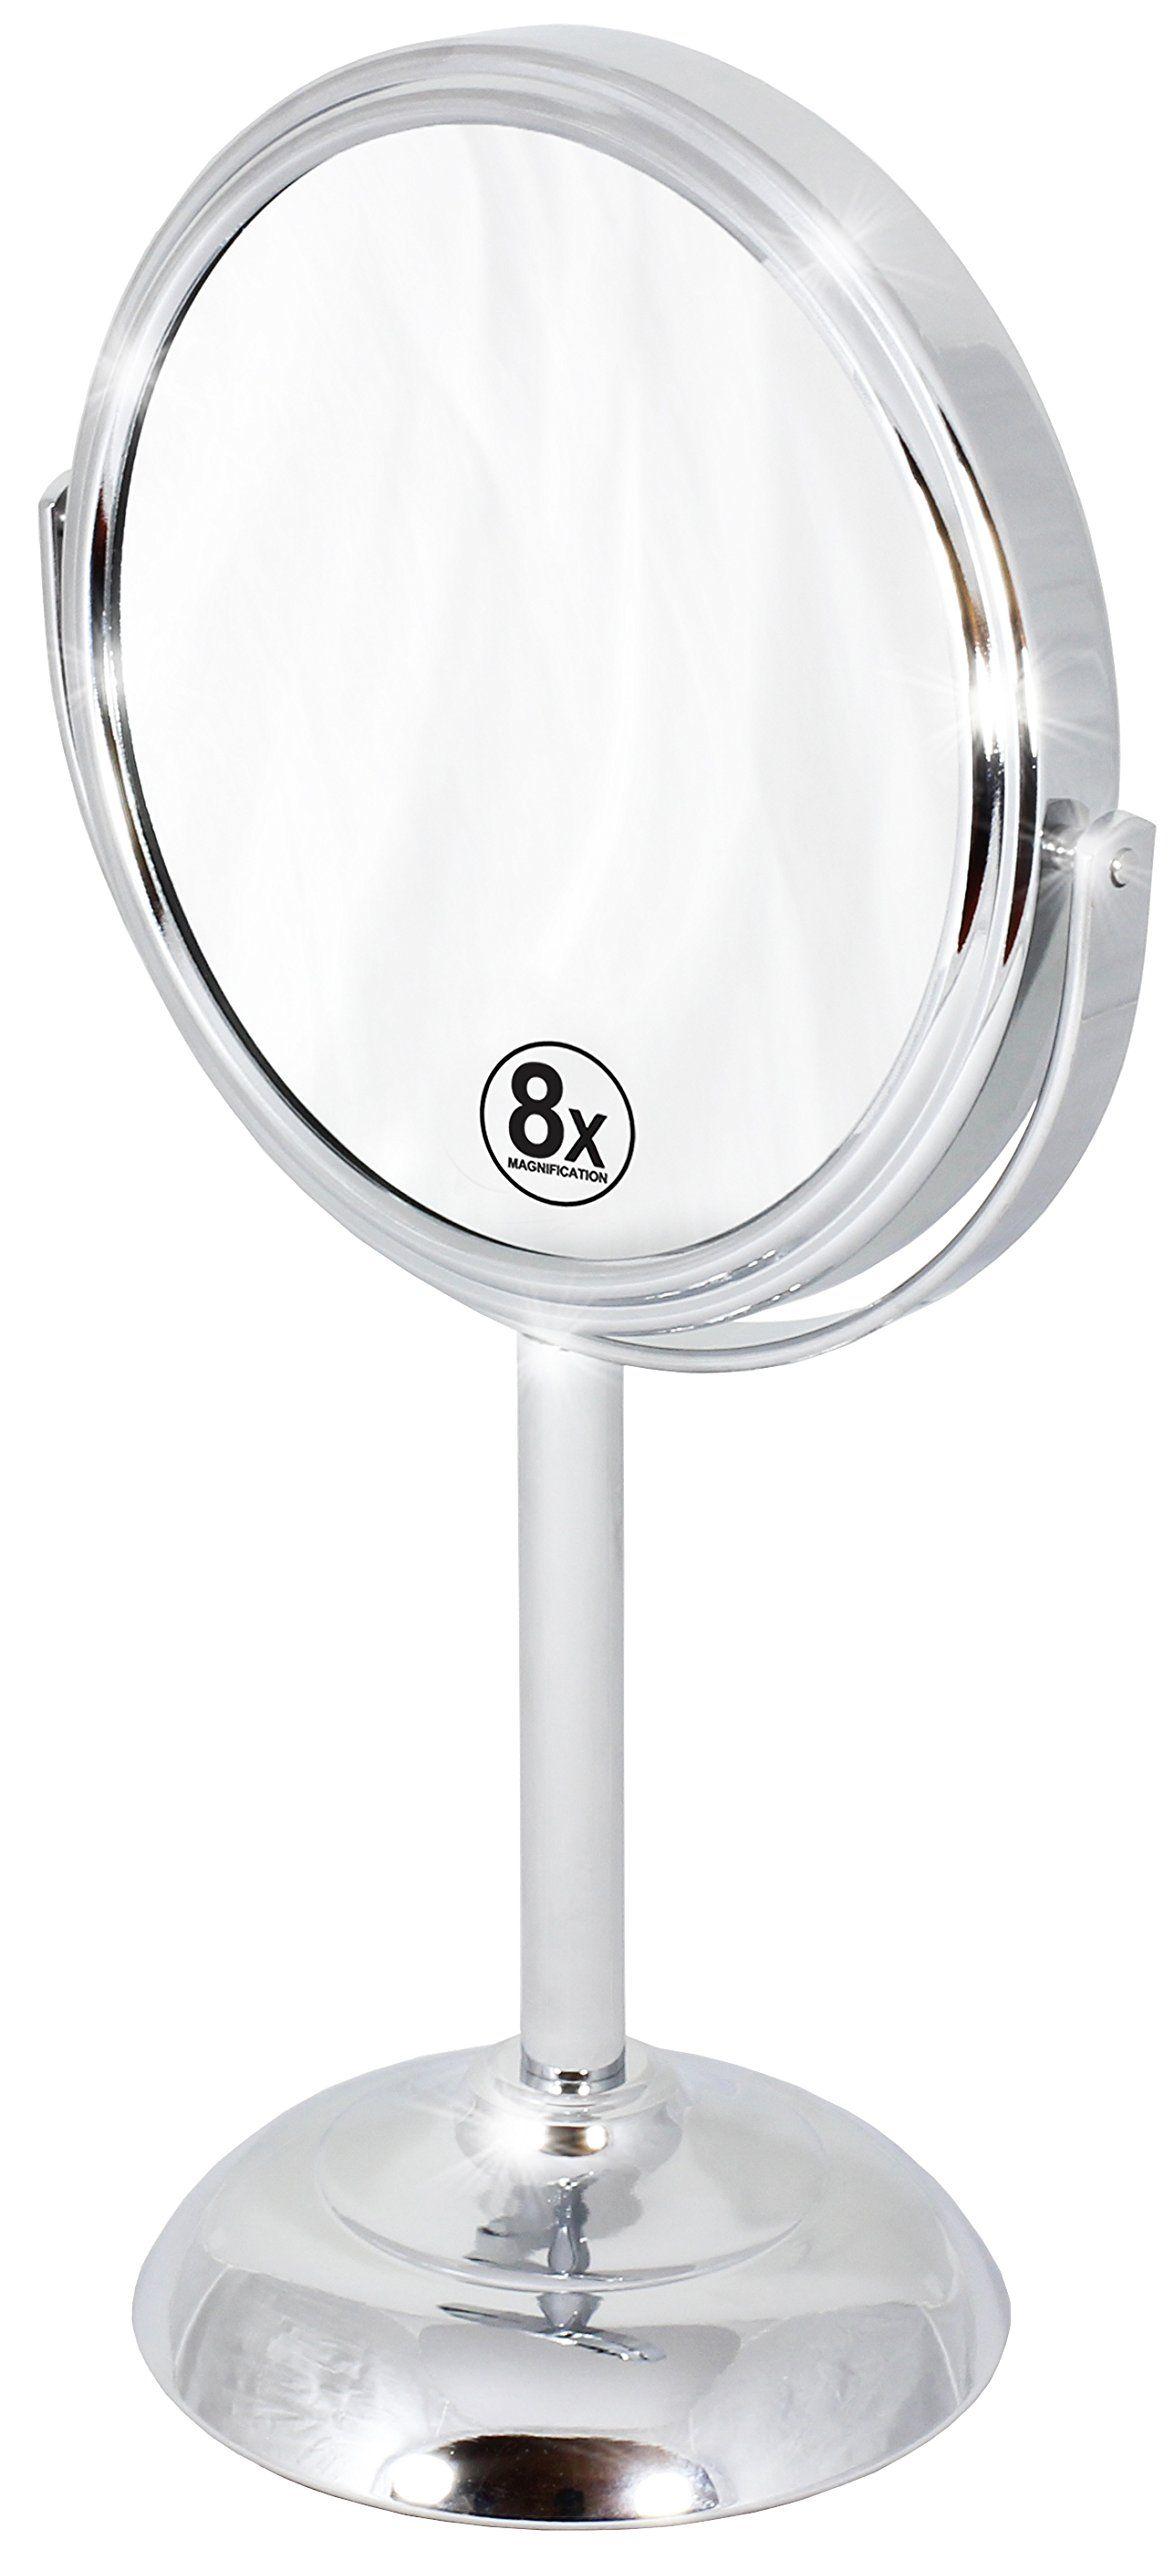 Decobros 6-inch Tabletop Two-Sided Swivel Vanity Mirror